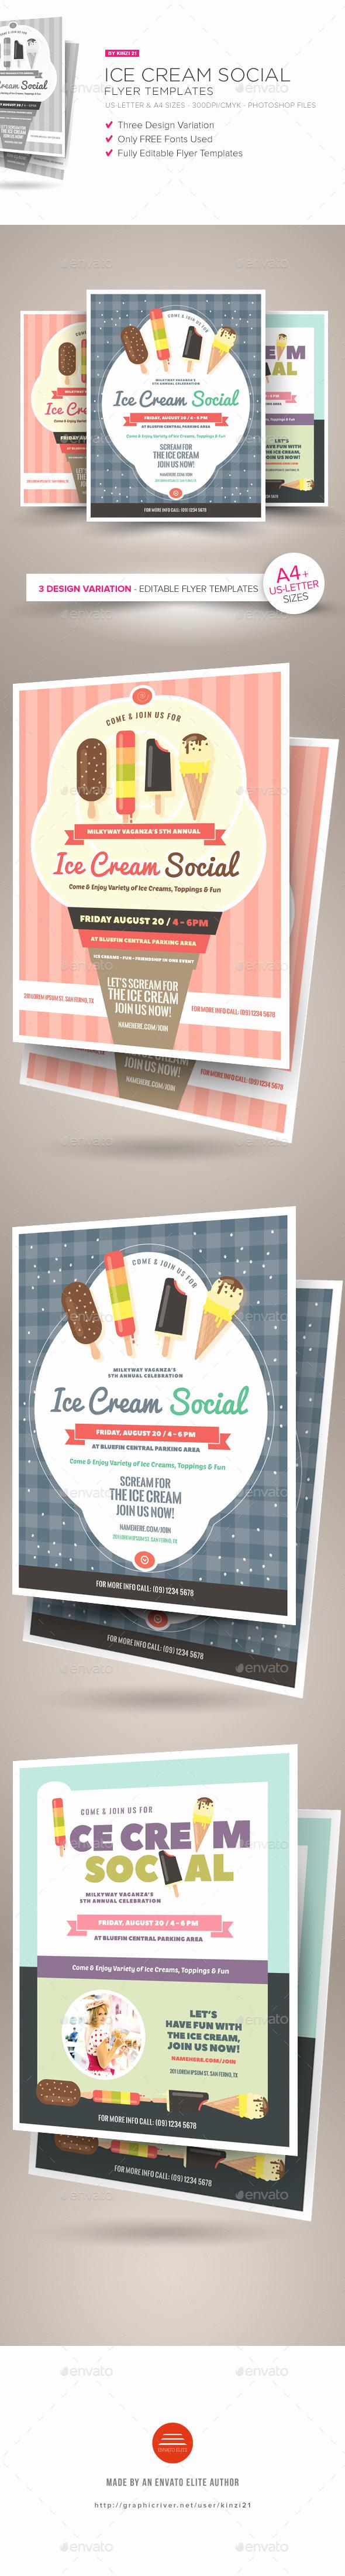 Ice Cream social Flyer Elegant Ice Cream social Flyer Templates by Kinzi21